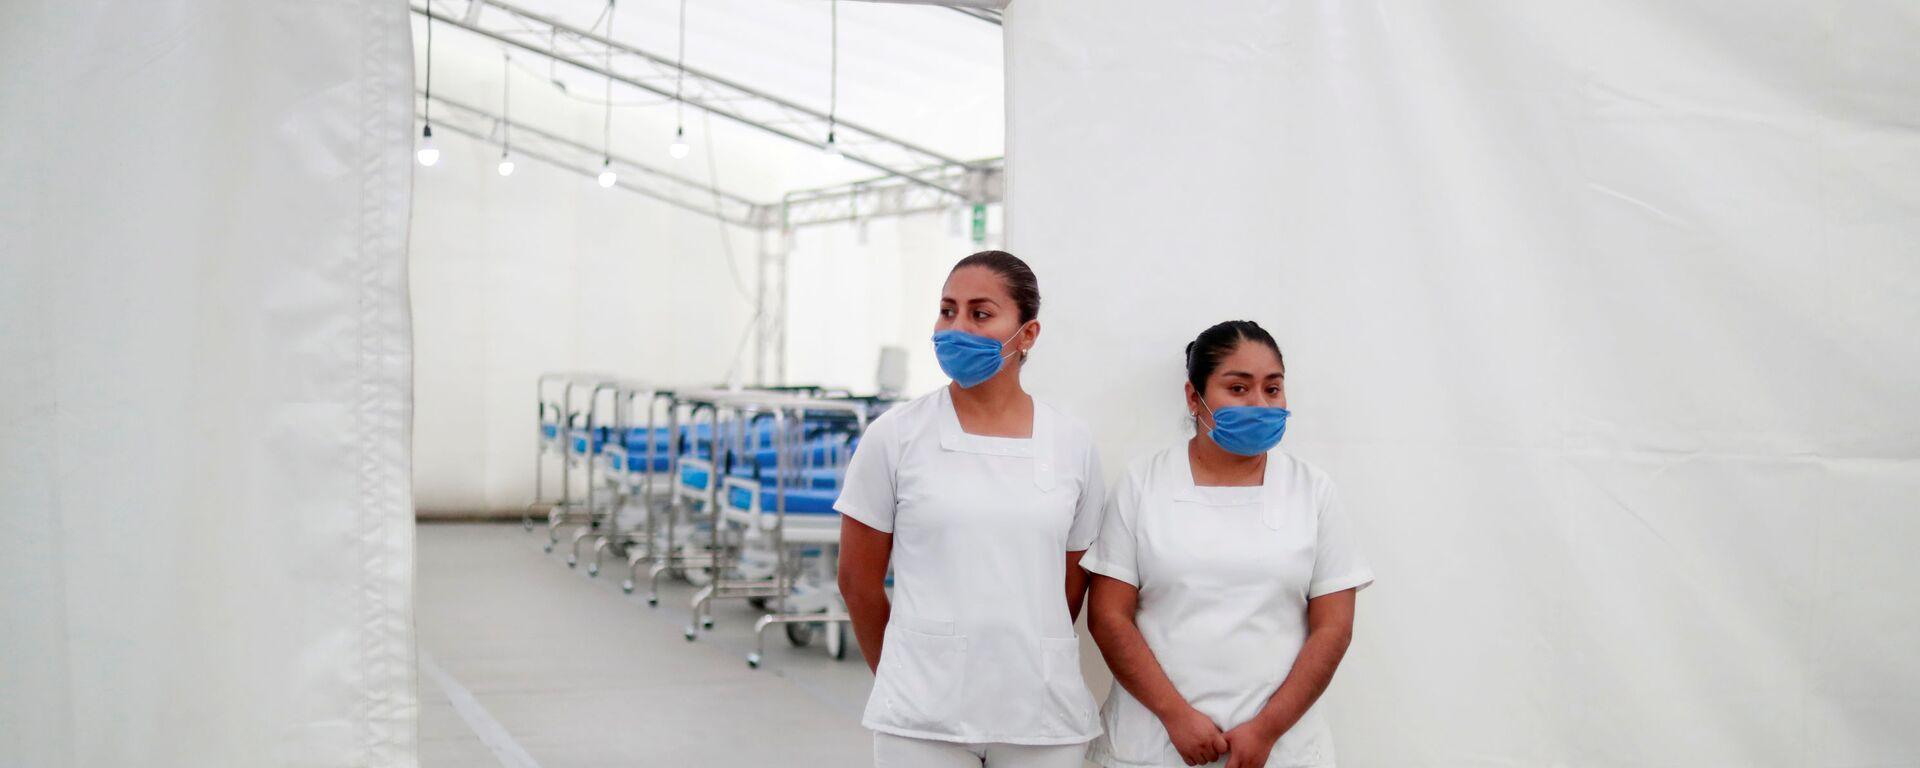 Personal médico en México durante la pandemia - Sputnik Mundo, 1920, 10.04.2020